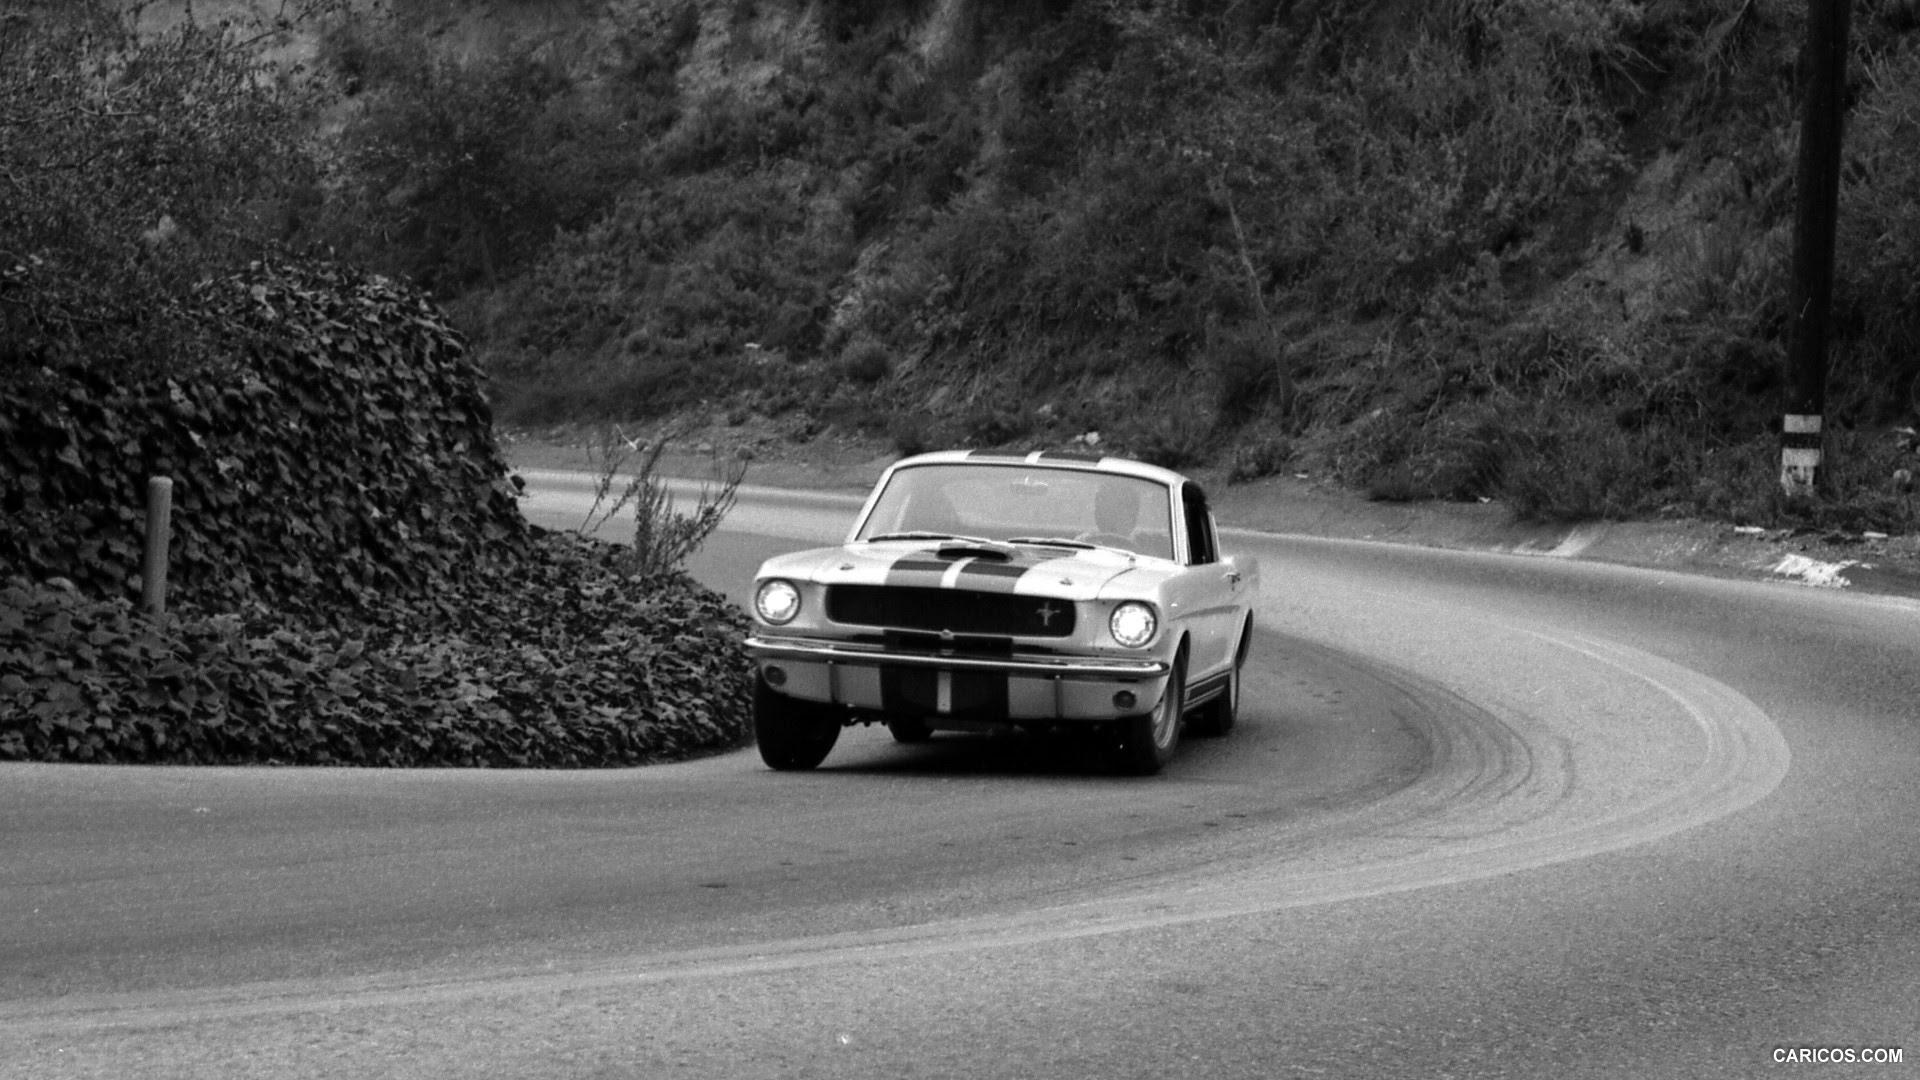 Ford Mustang Wallpaper Ipad